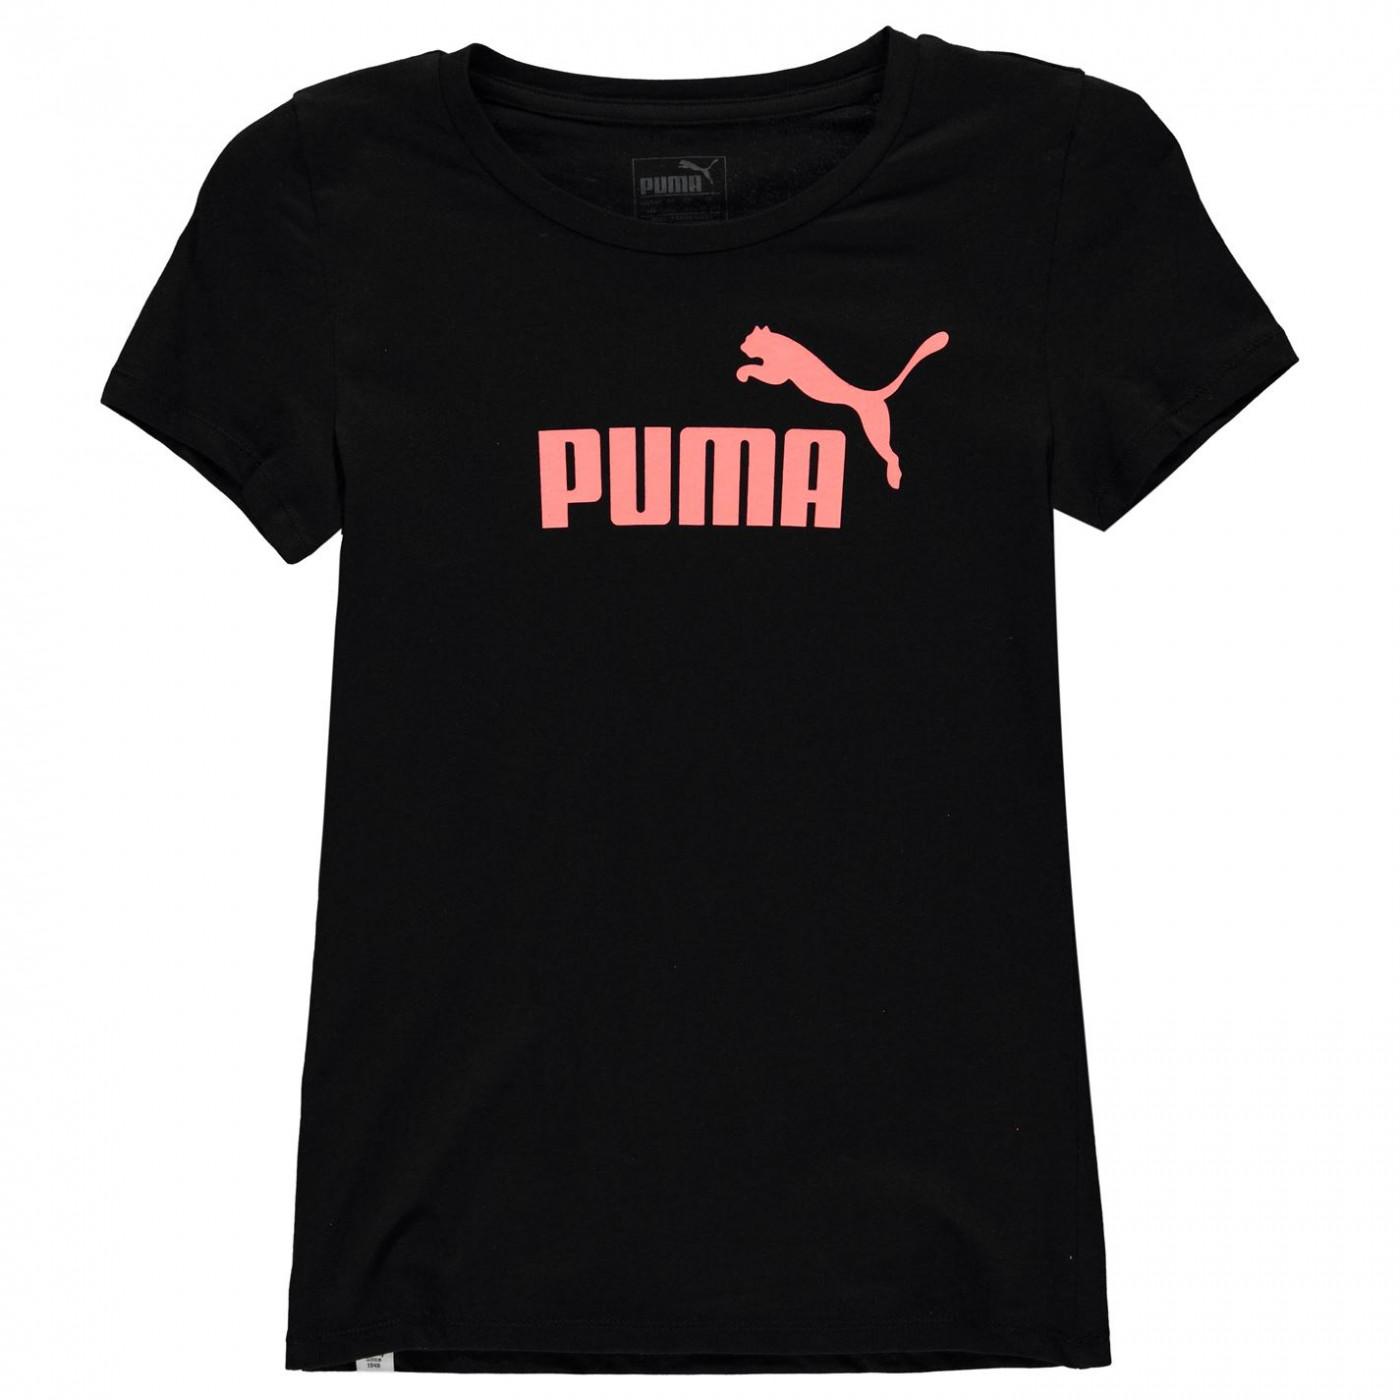 Triko Puma Logo Print T Shirt detské Girls